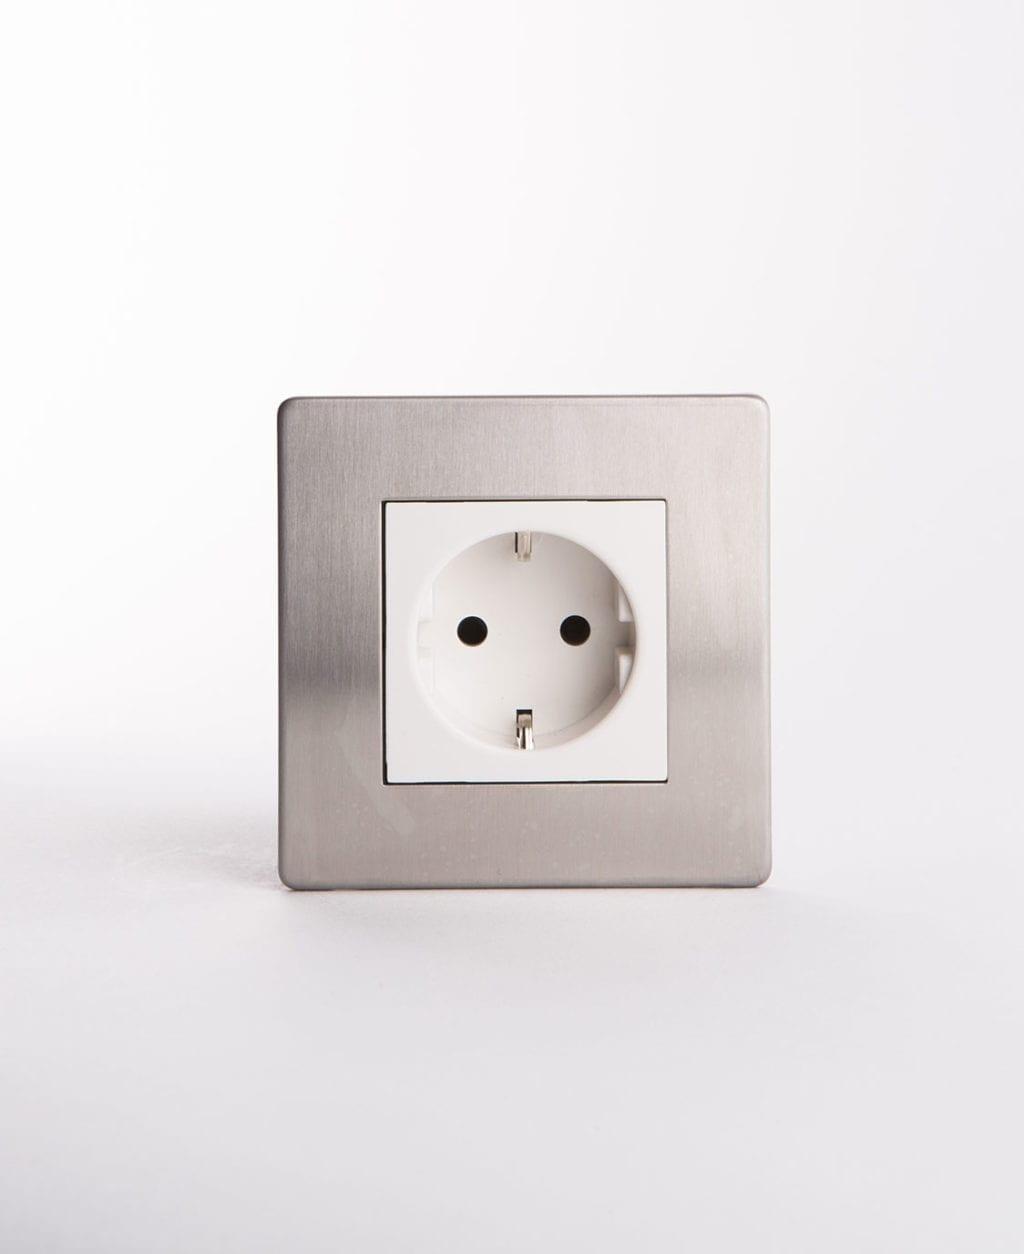 silver & white Schuko single socket